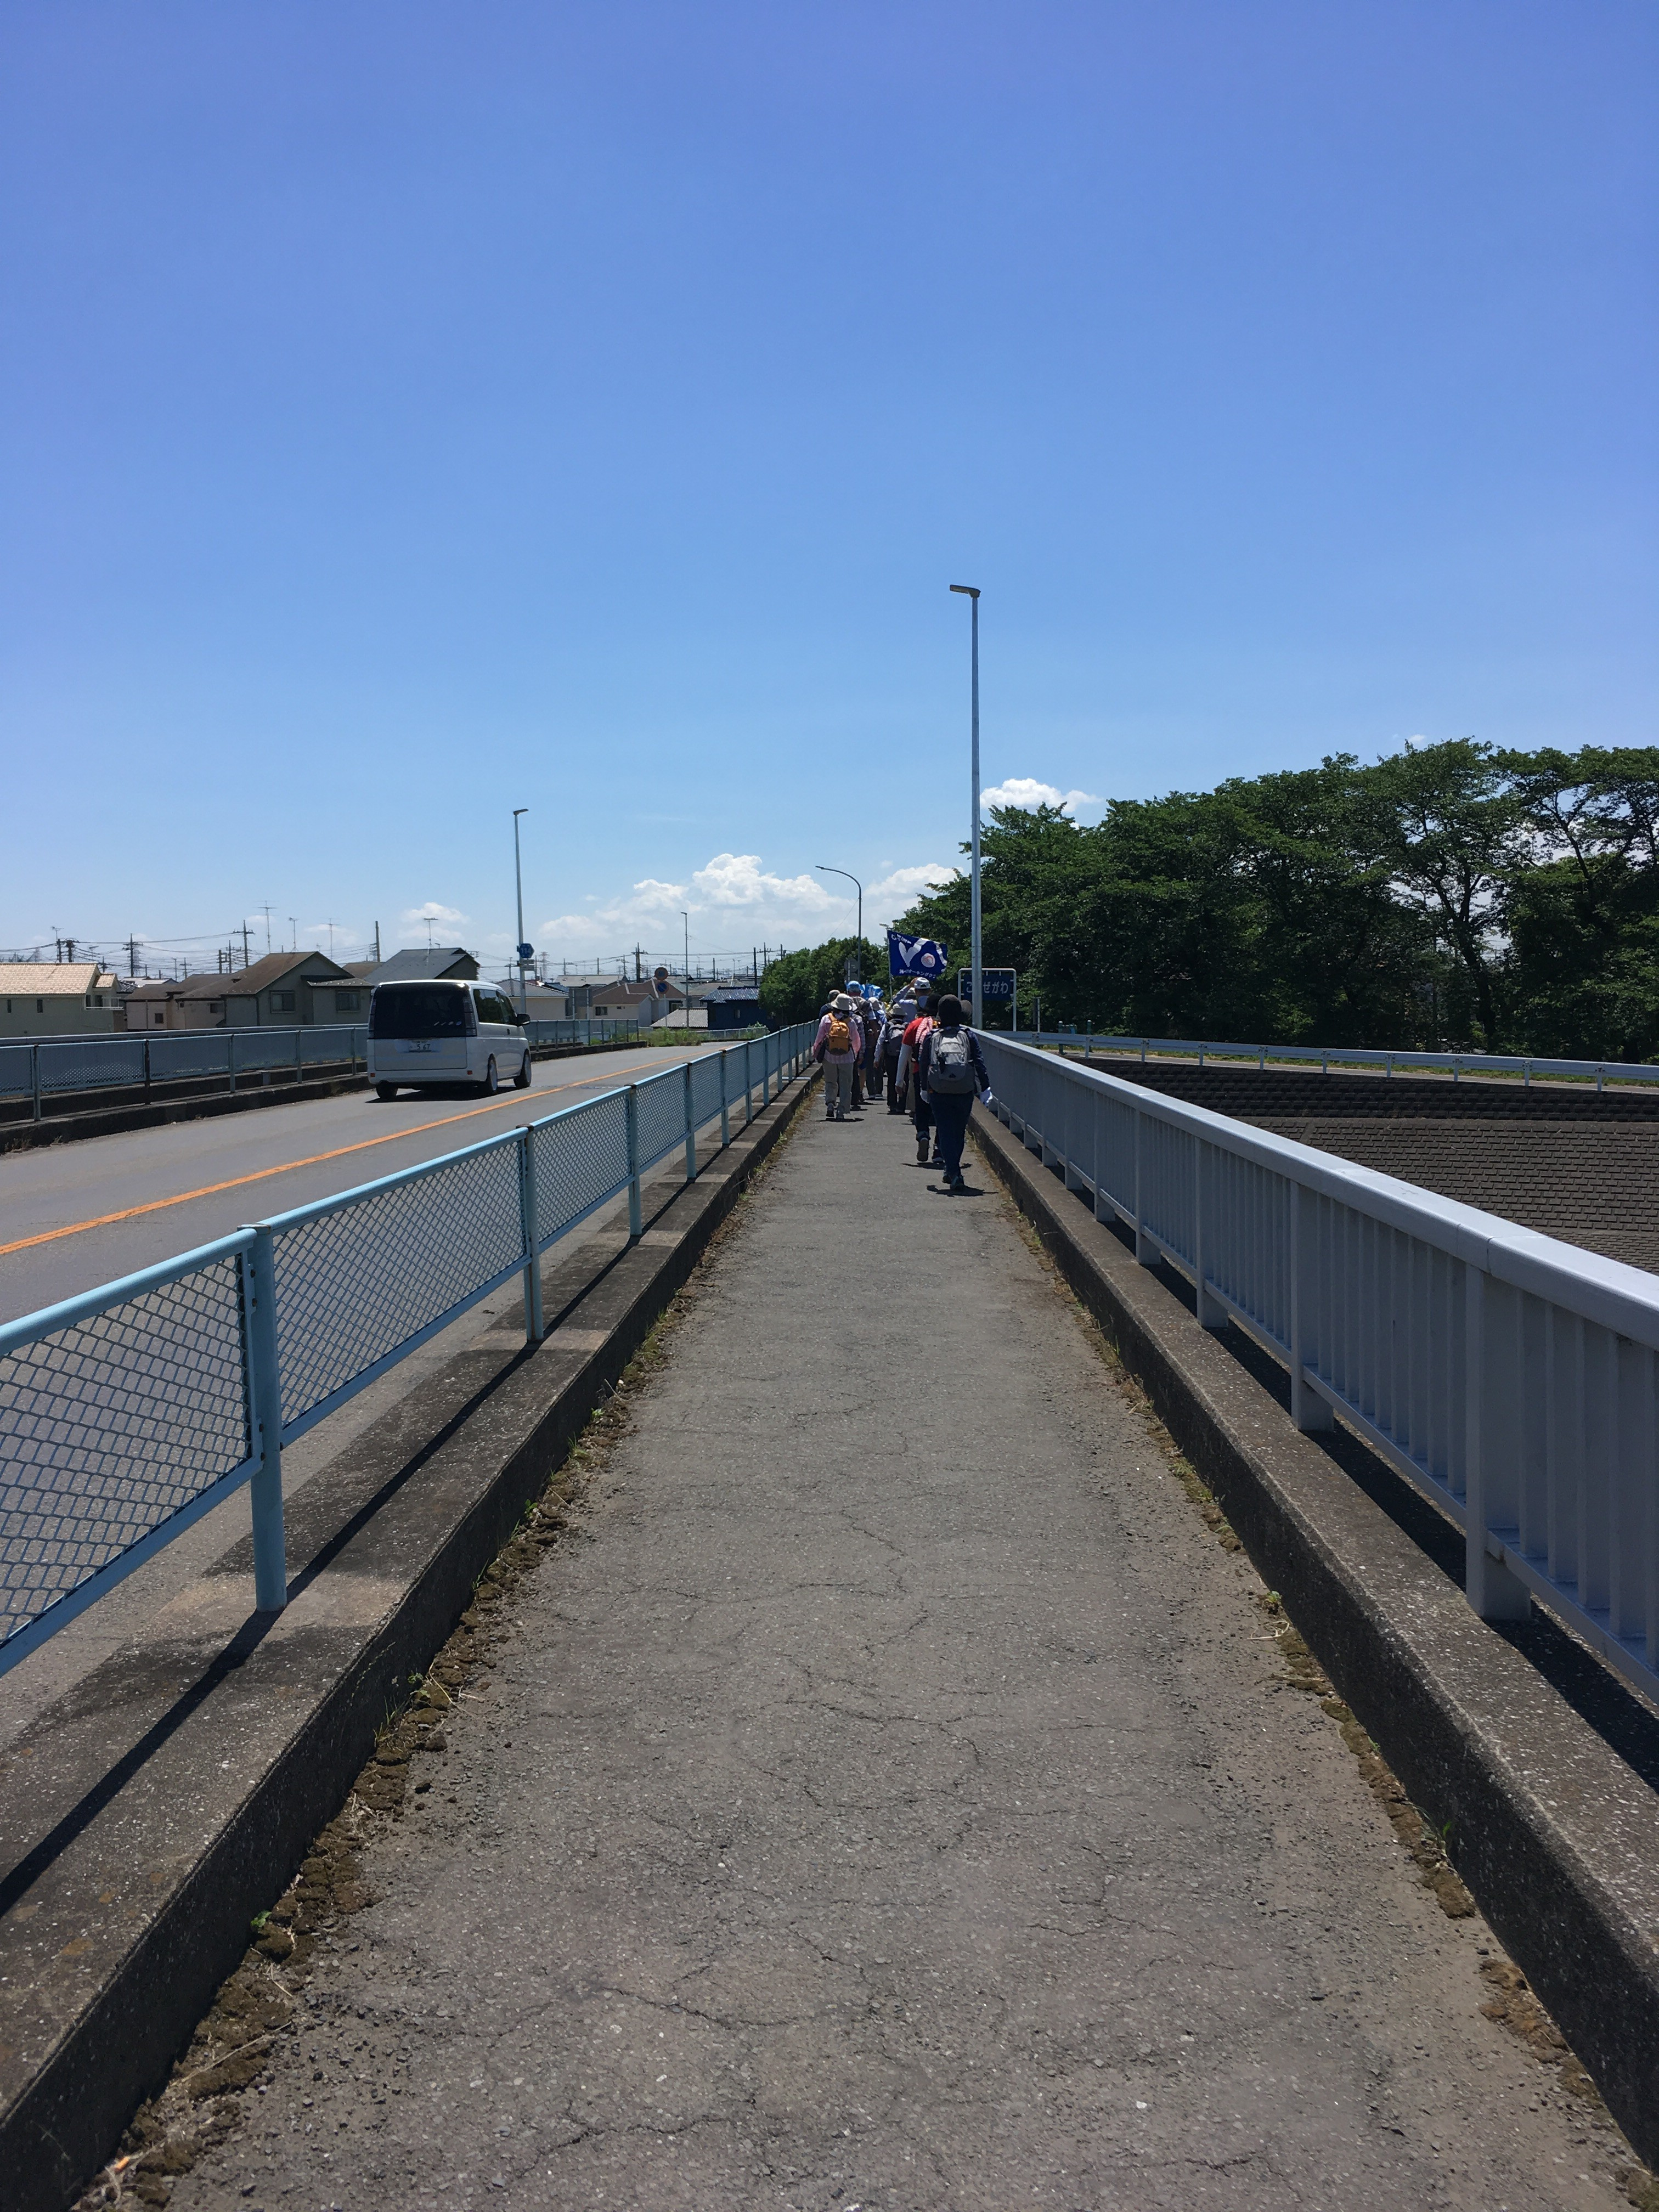 吉田公園周辺の小畔川橋